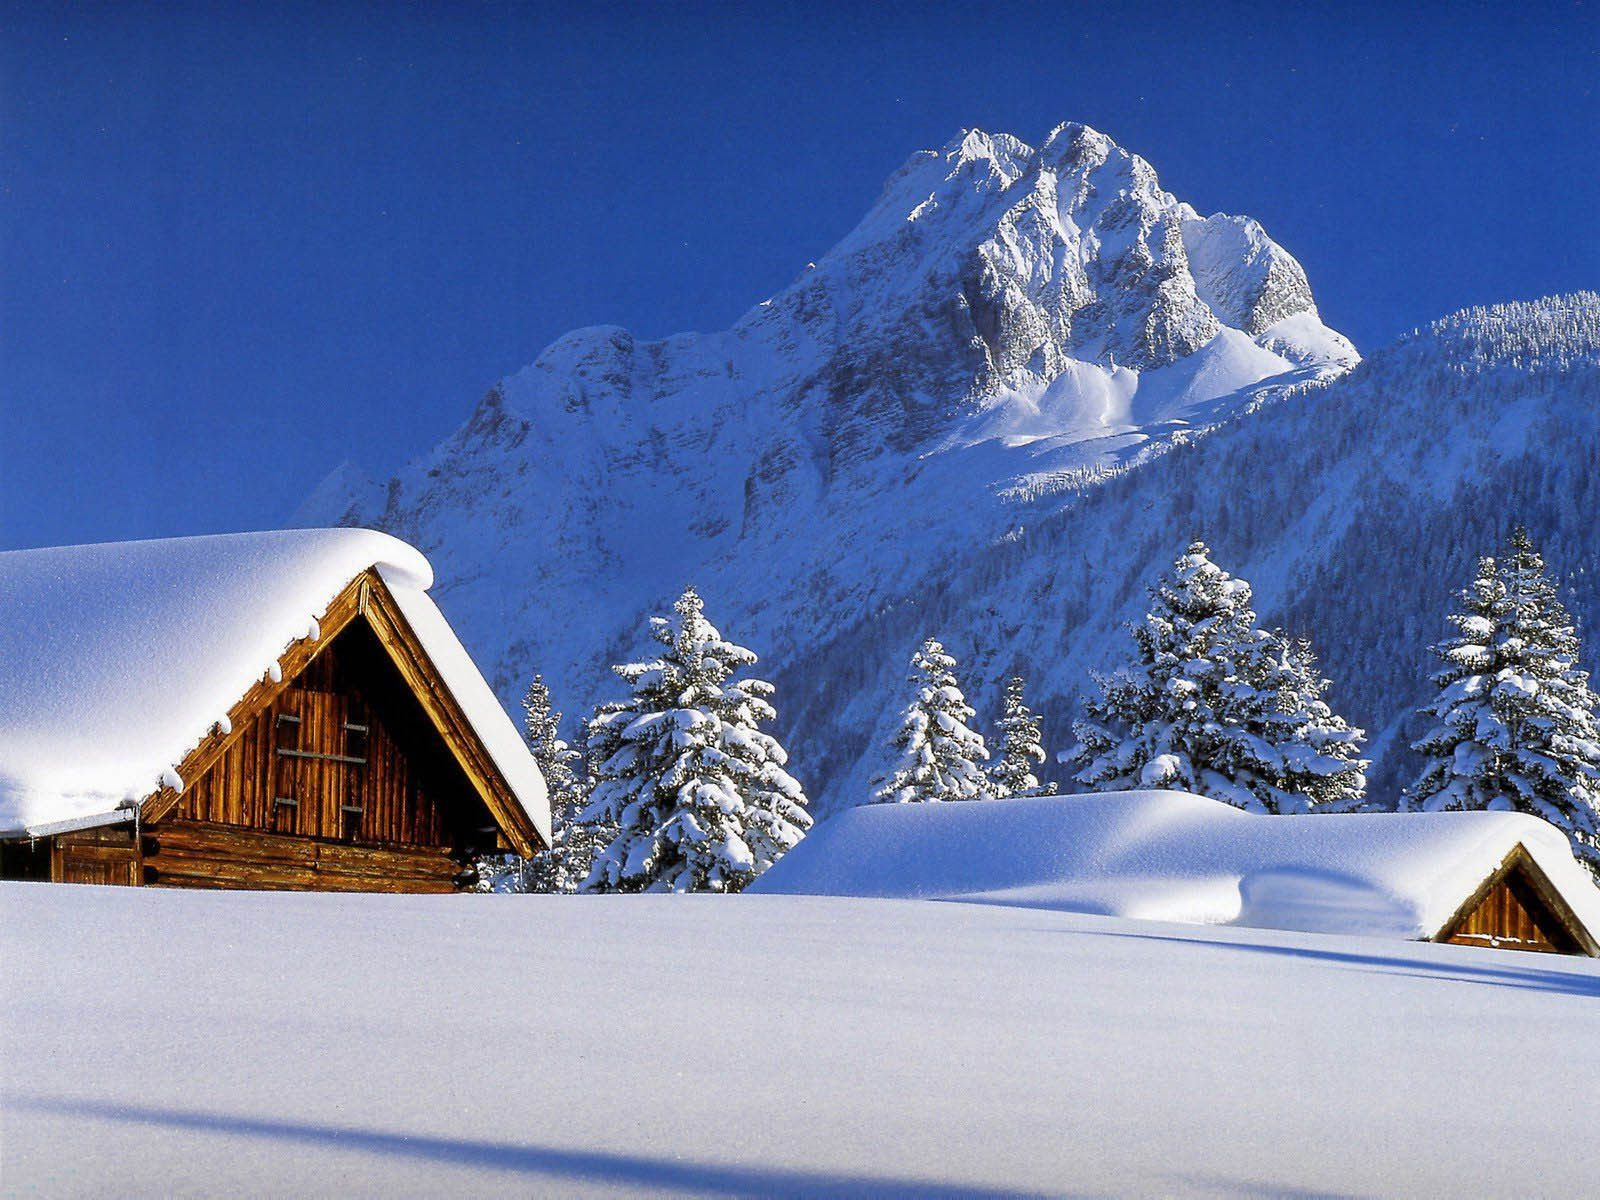 Snow Wallpapers Роспись картинки, Картины пейзажа и